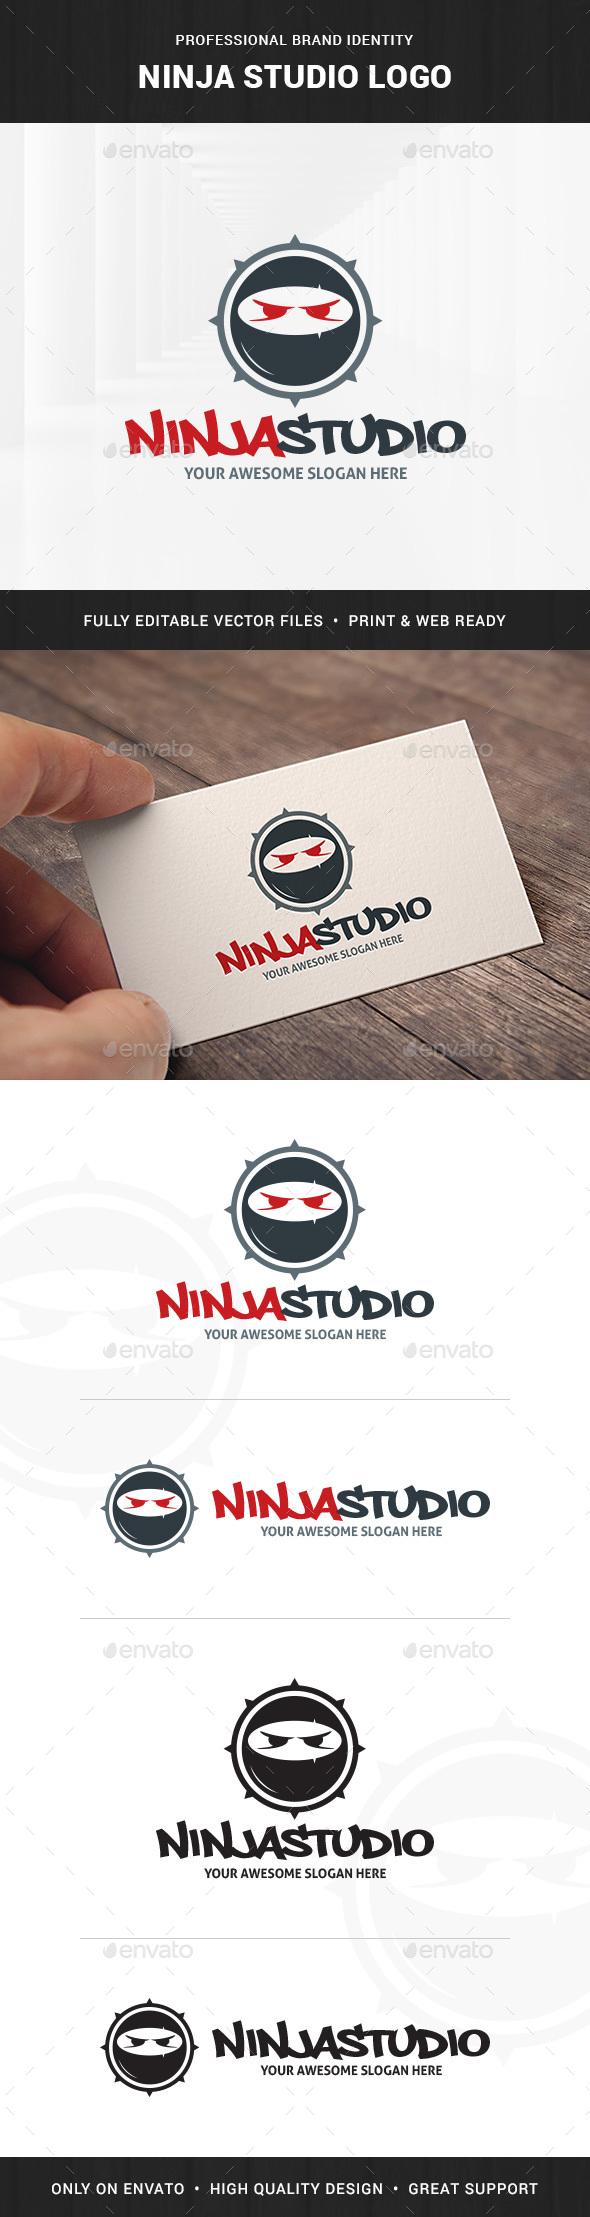 Ninja Studio Logo